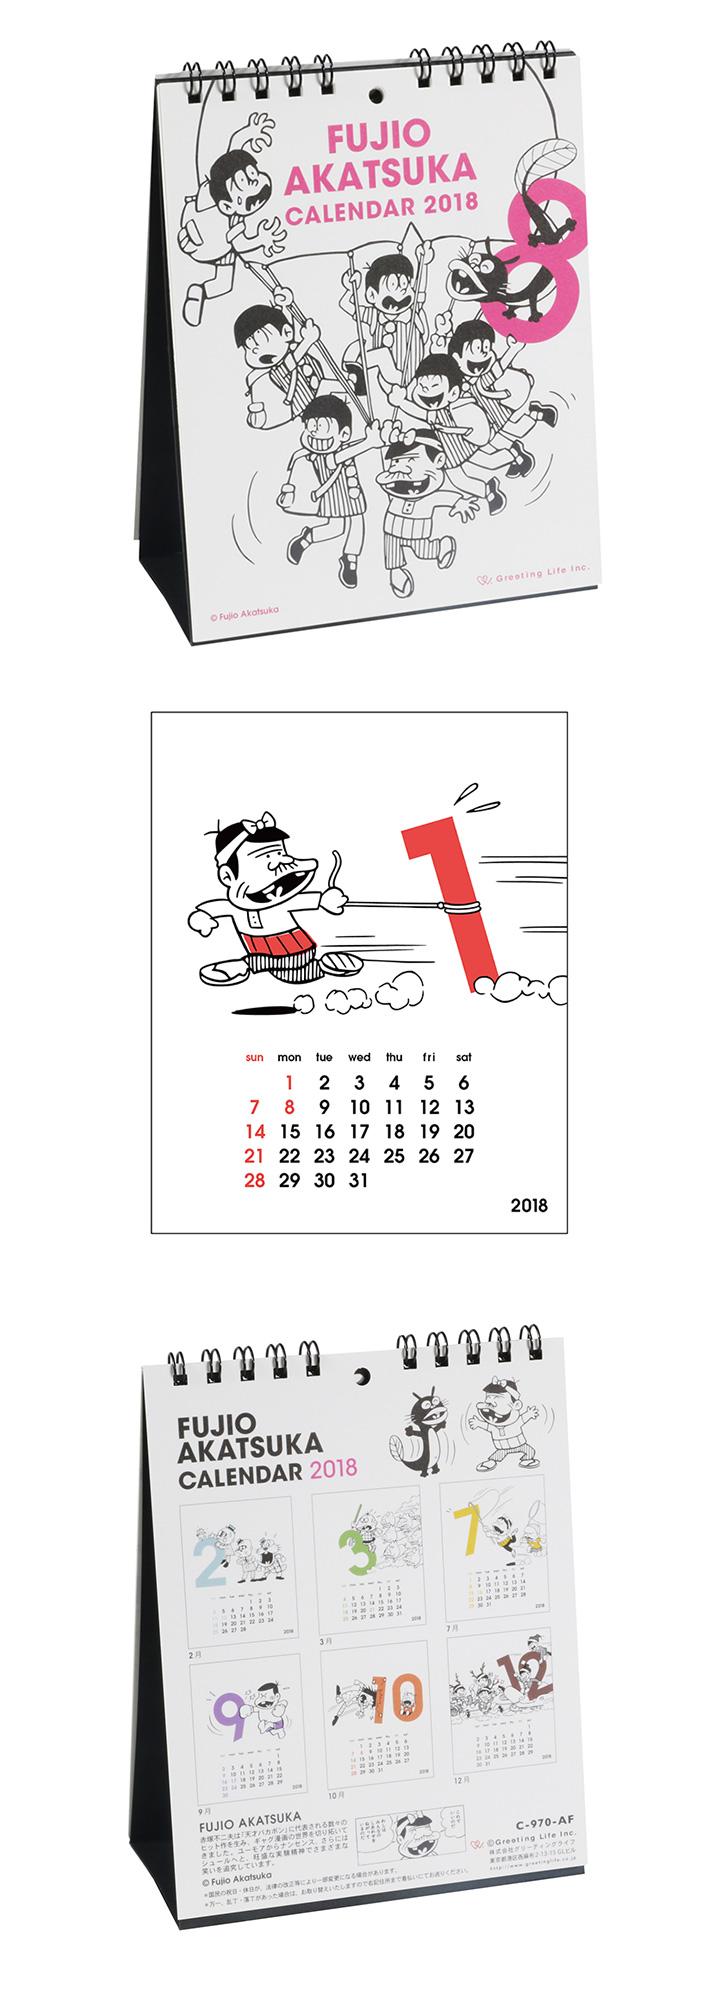 2018 FUJIO AKATSUKA卓上カレンダー